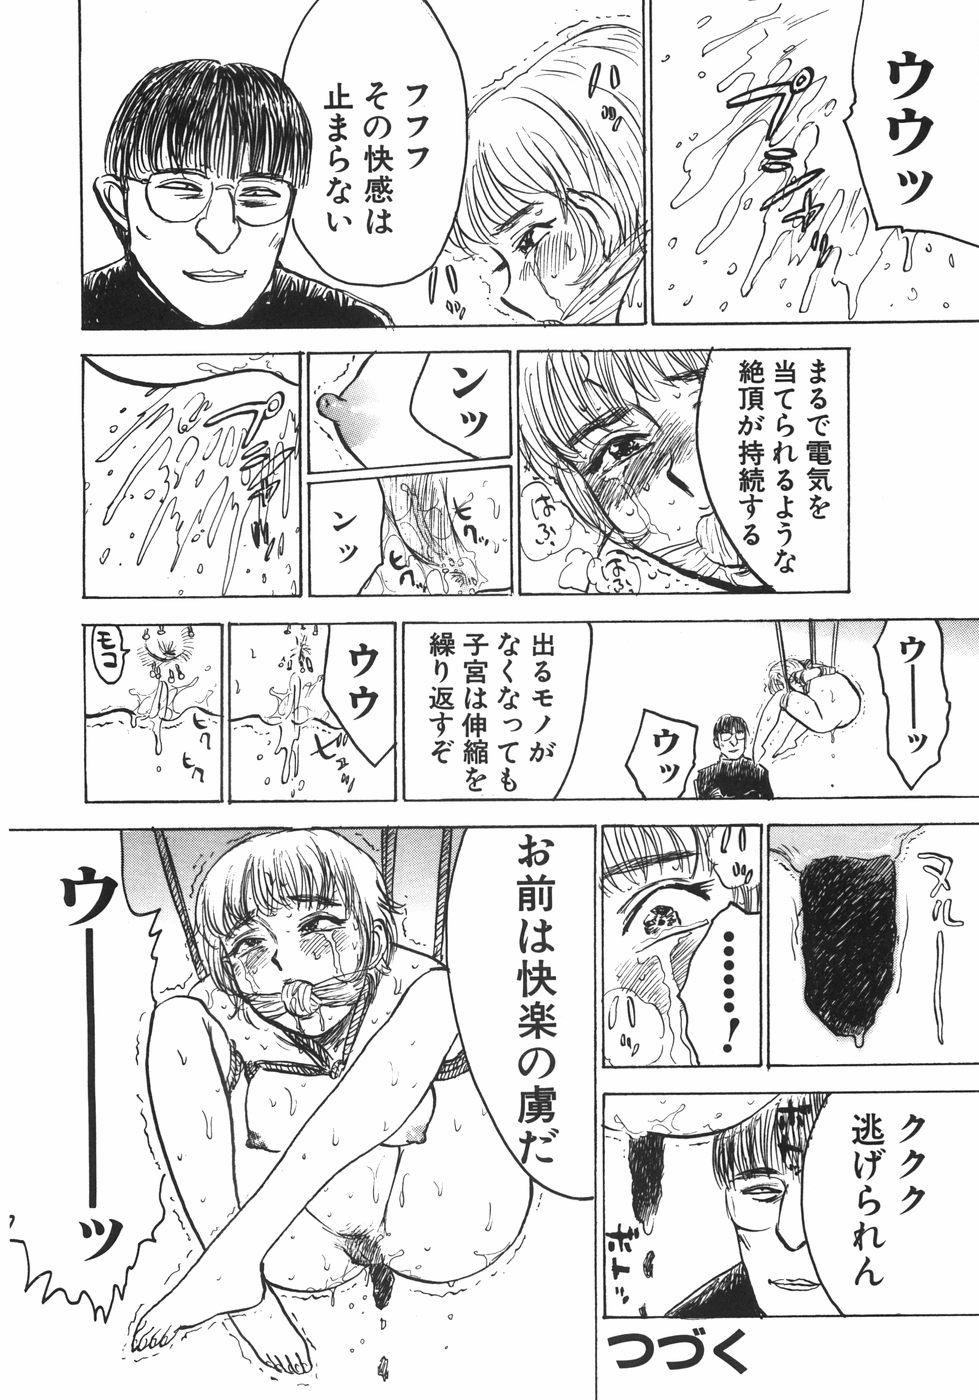 Ningyou no Yakata - The Doll House 120